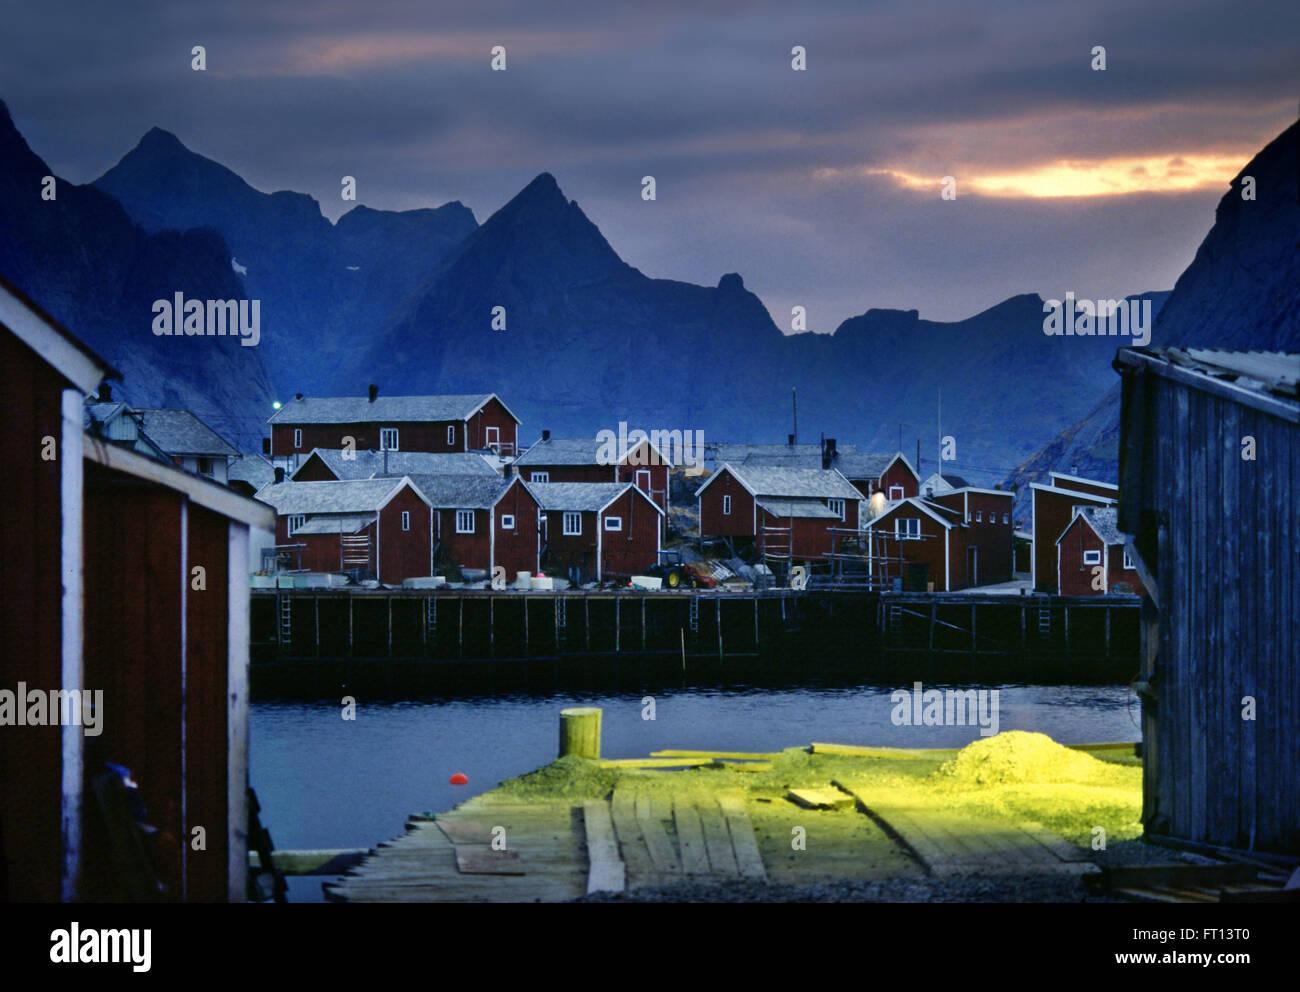 Rorbu fisherman capanna in Reine, Reine, Isole Lofoten in Norvegia e Scandinavia Immagini Stock